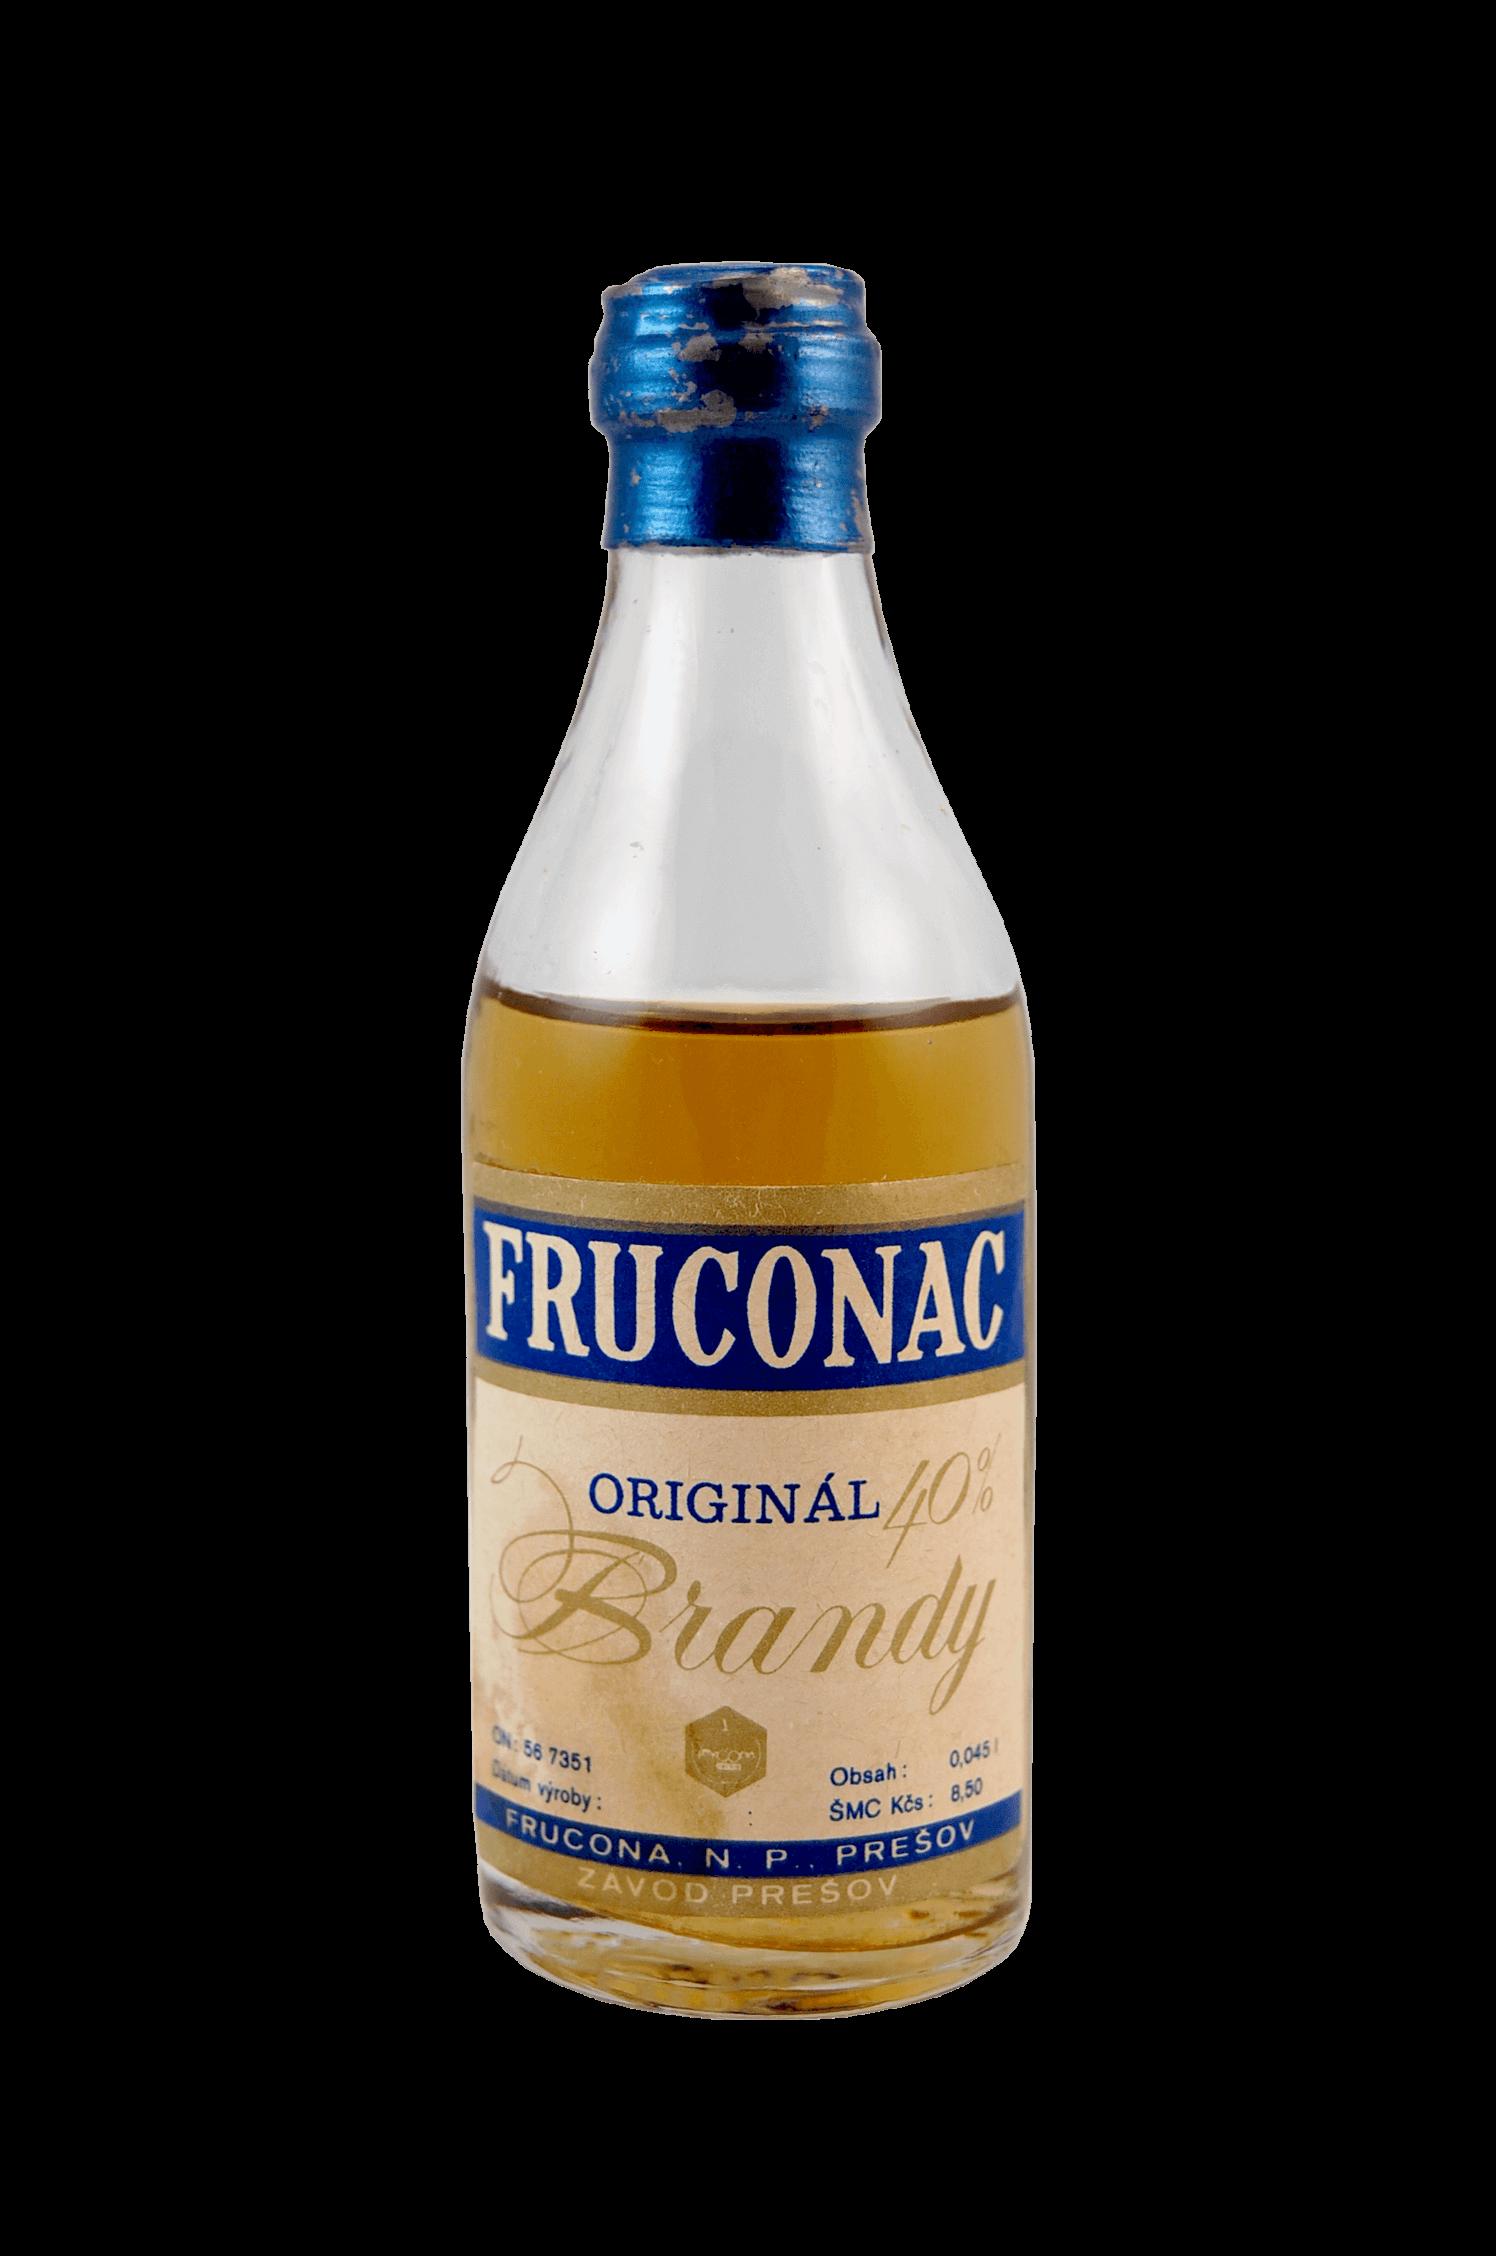 Fruconac Originál Brandy